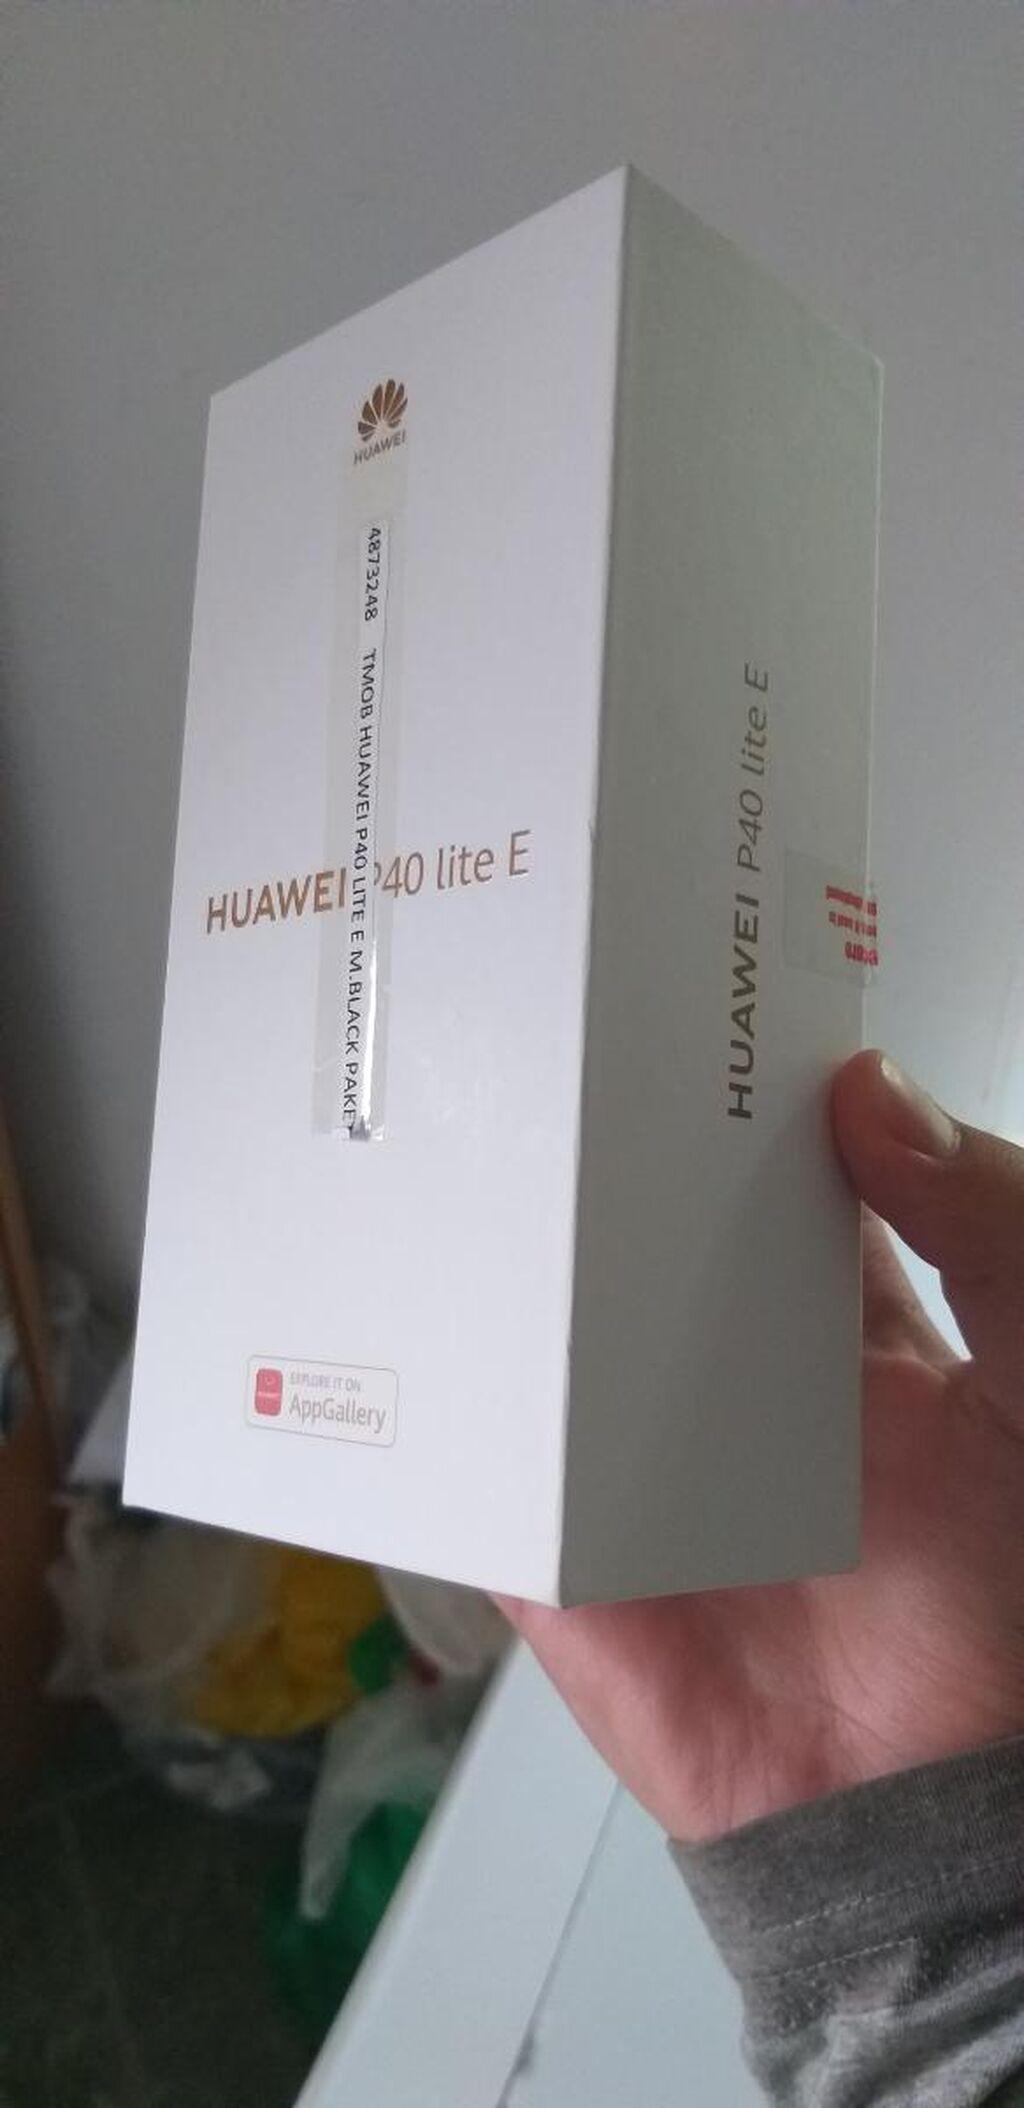 Kutija za Huawei P40 Lite,kao nova